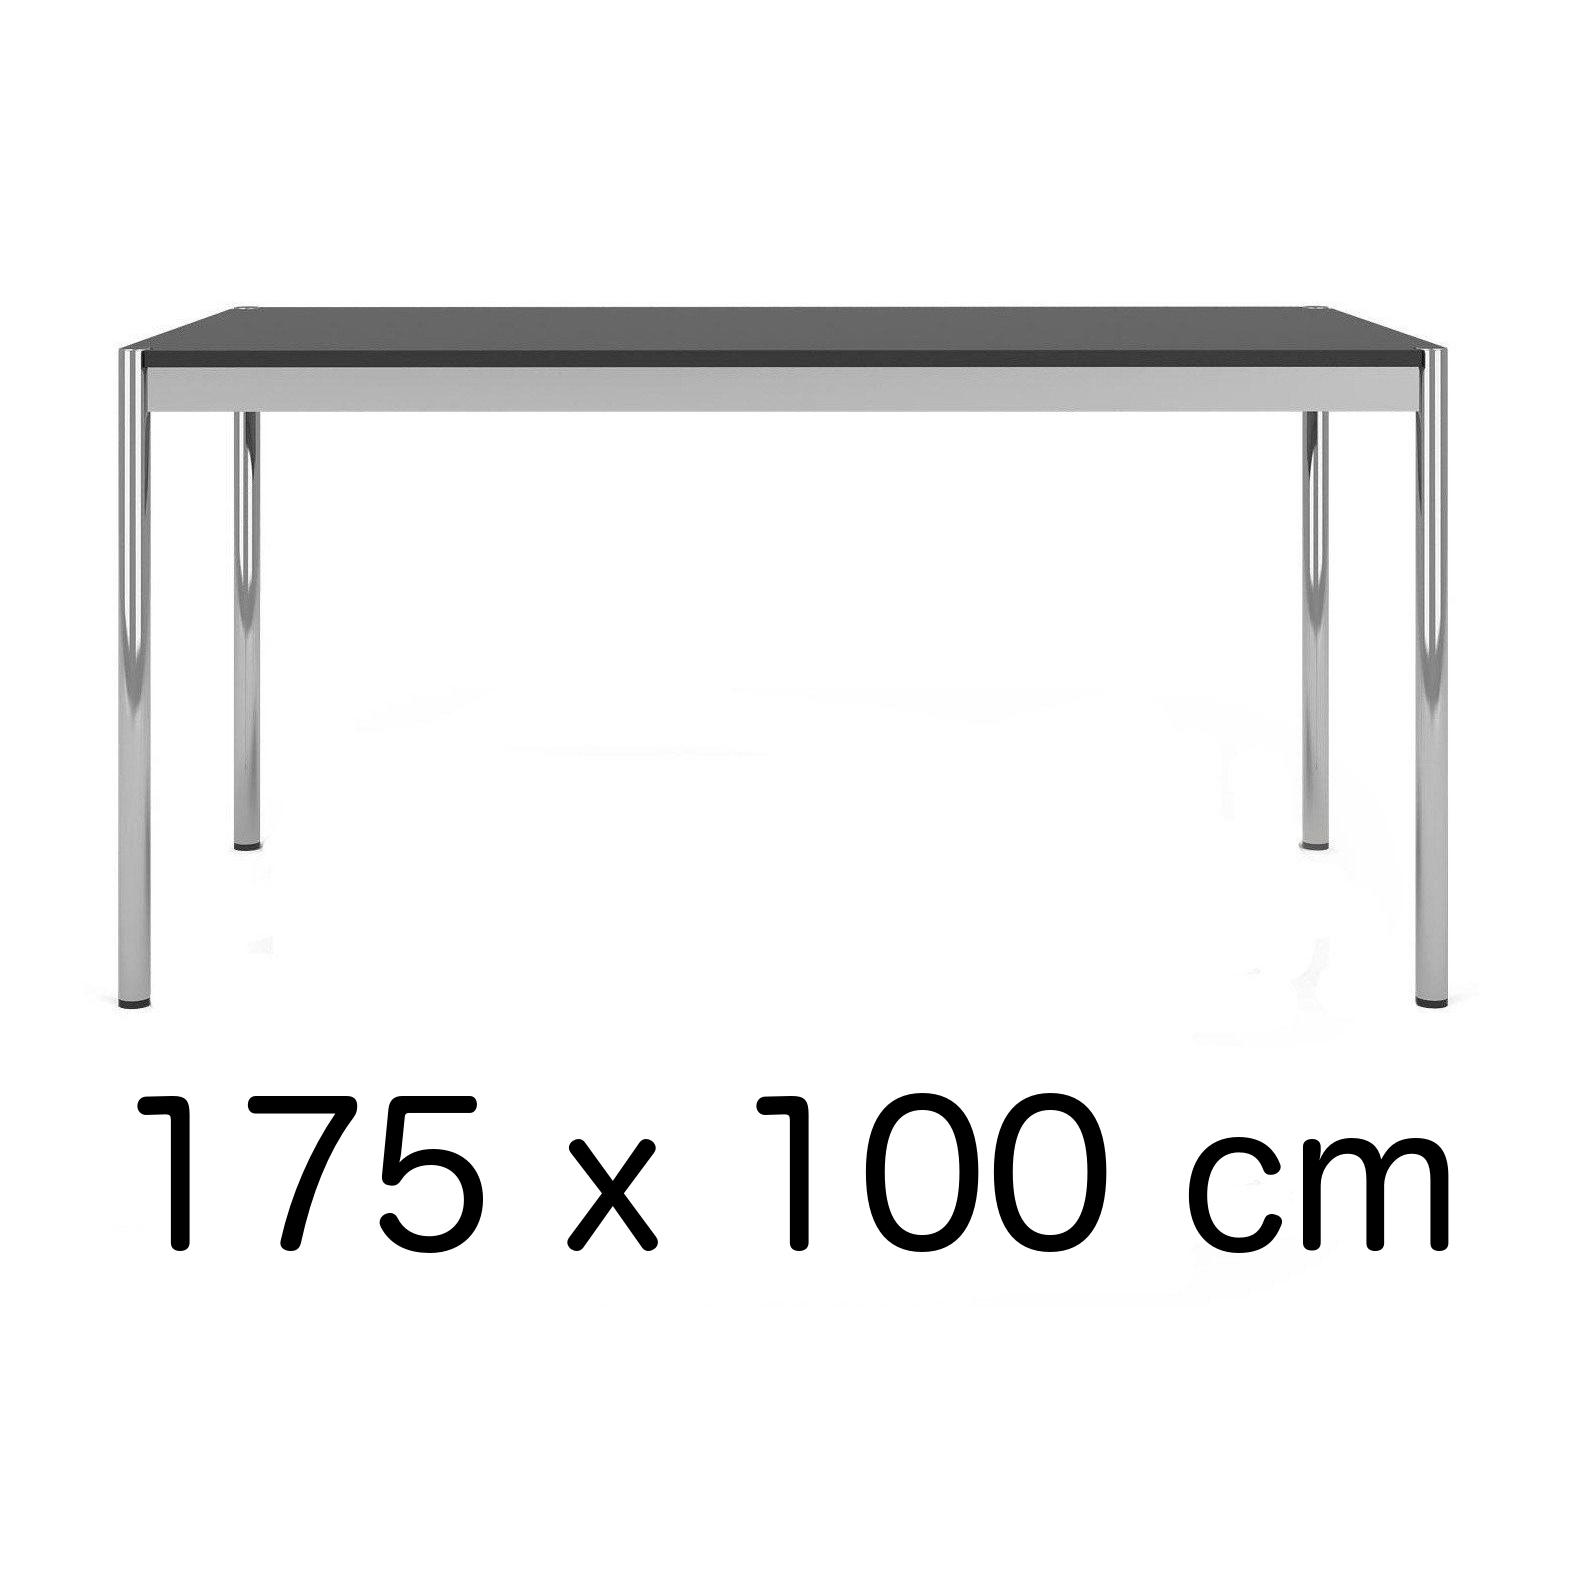 USM designové Haller stoly 100x175cm